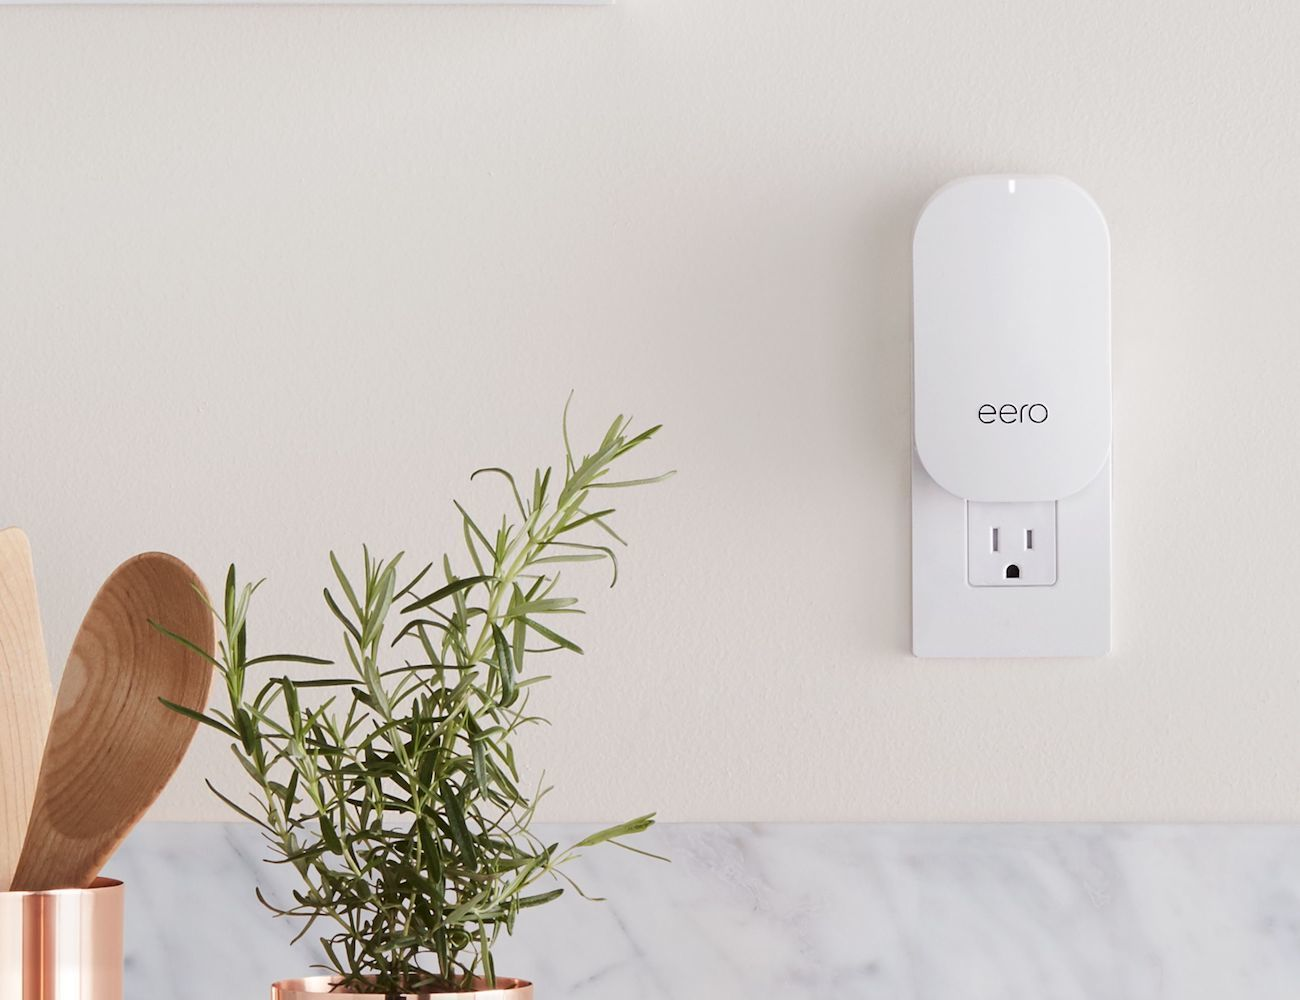 eero True Mesh Home Wi-Fi System loading=